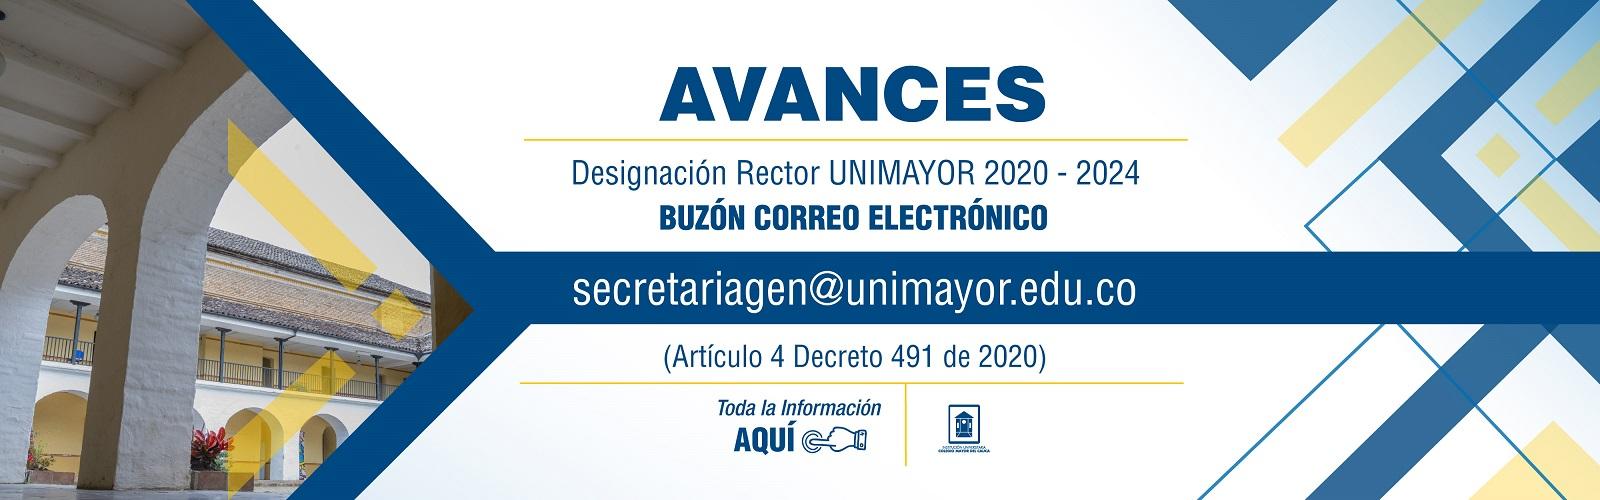 Buzon_Correro_Electronico